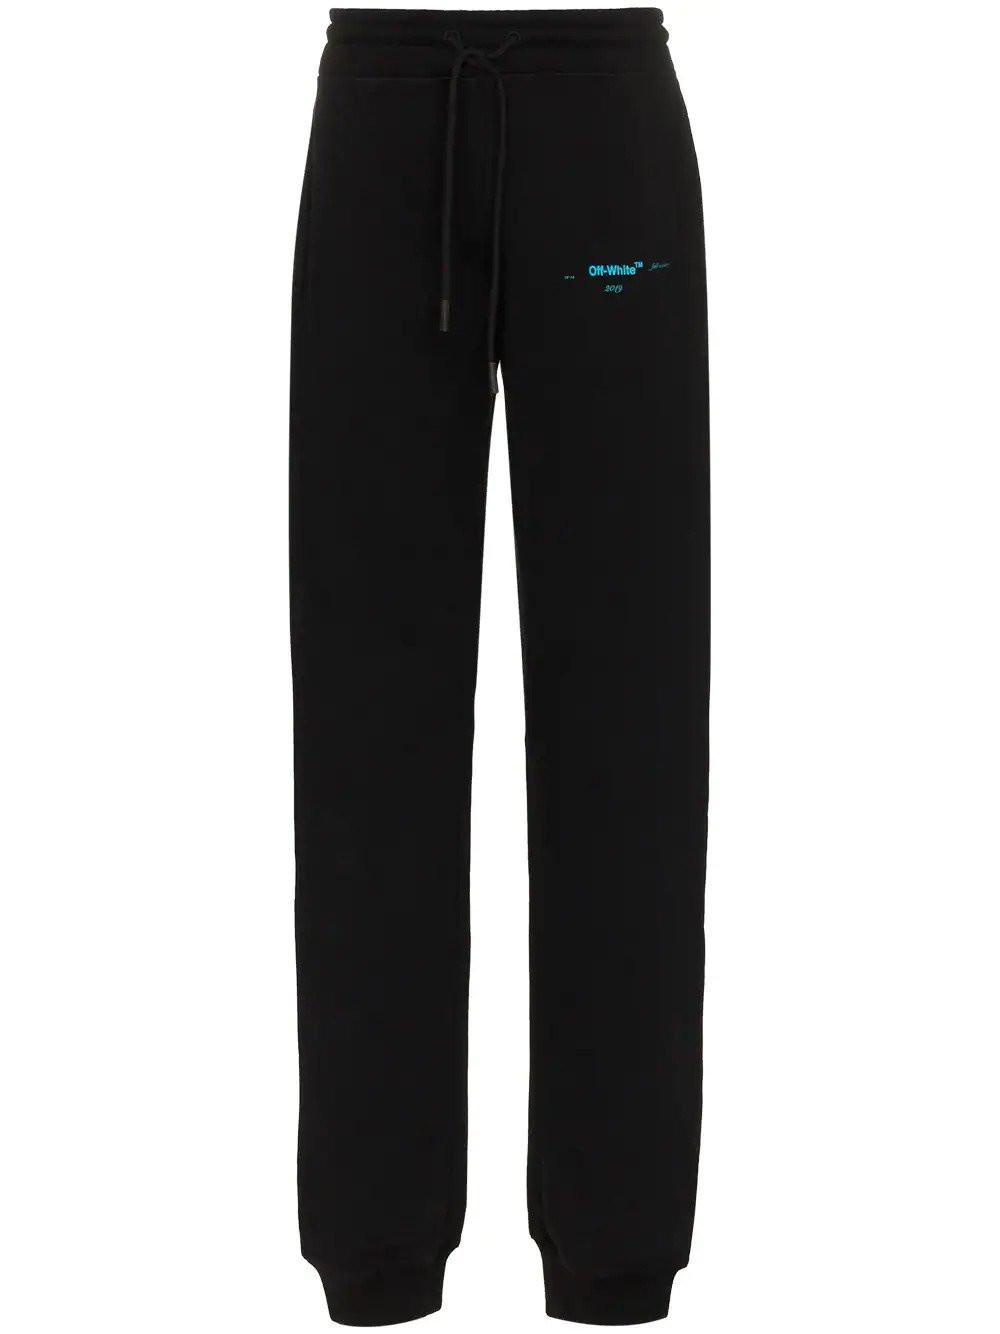 976d1f4d4 Off-White C O Virgil Abloh Black Sweatpants in Black for Men - Lyst